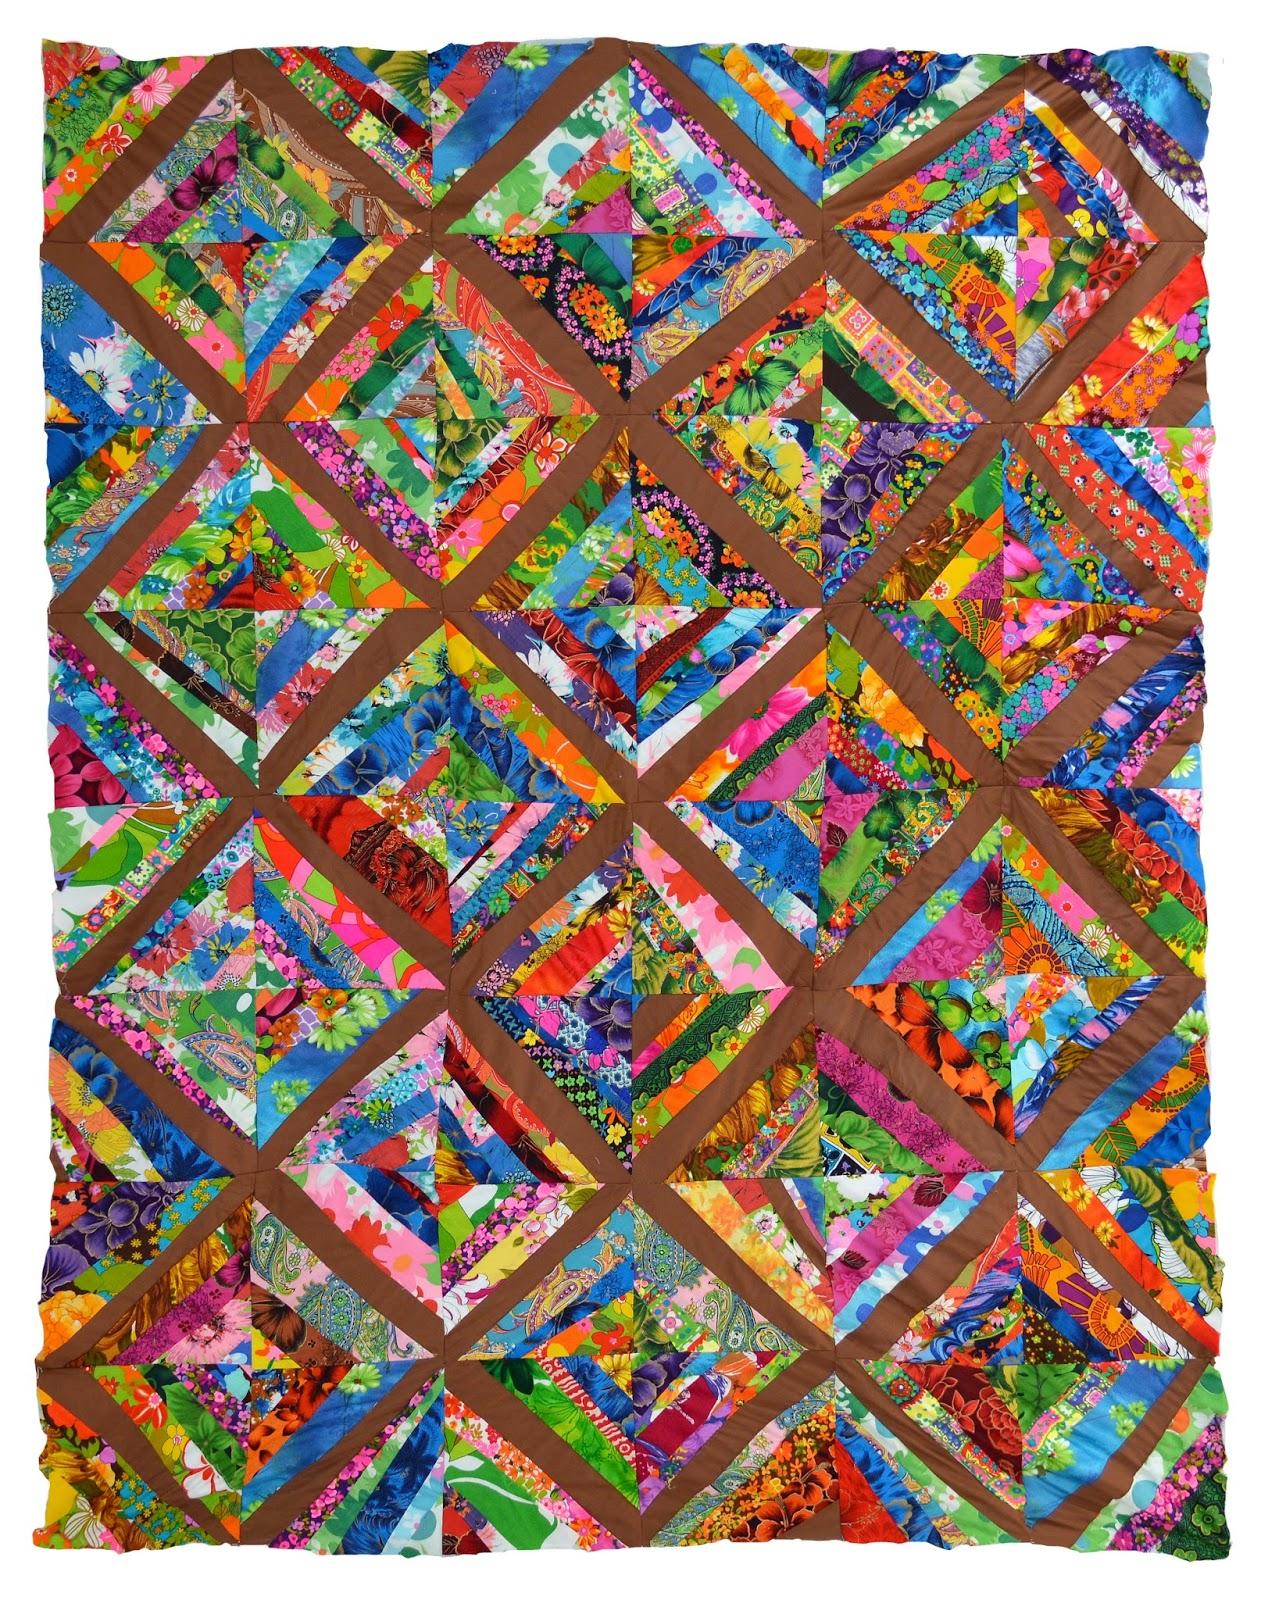 Wonkyworld open tuesday kalakoa discovering the for Scrap quilt